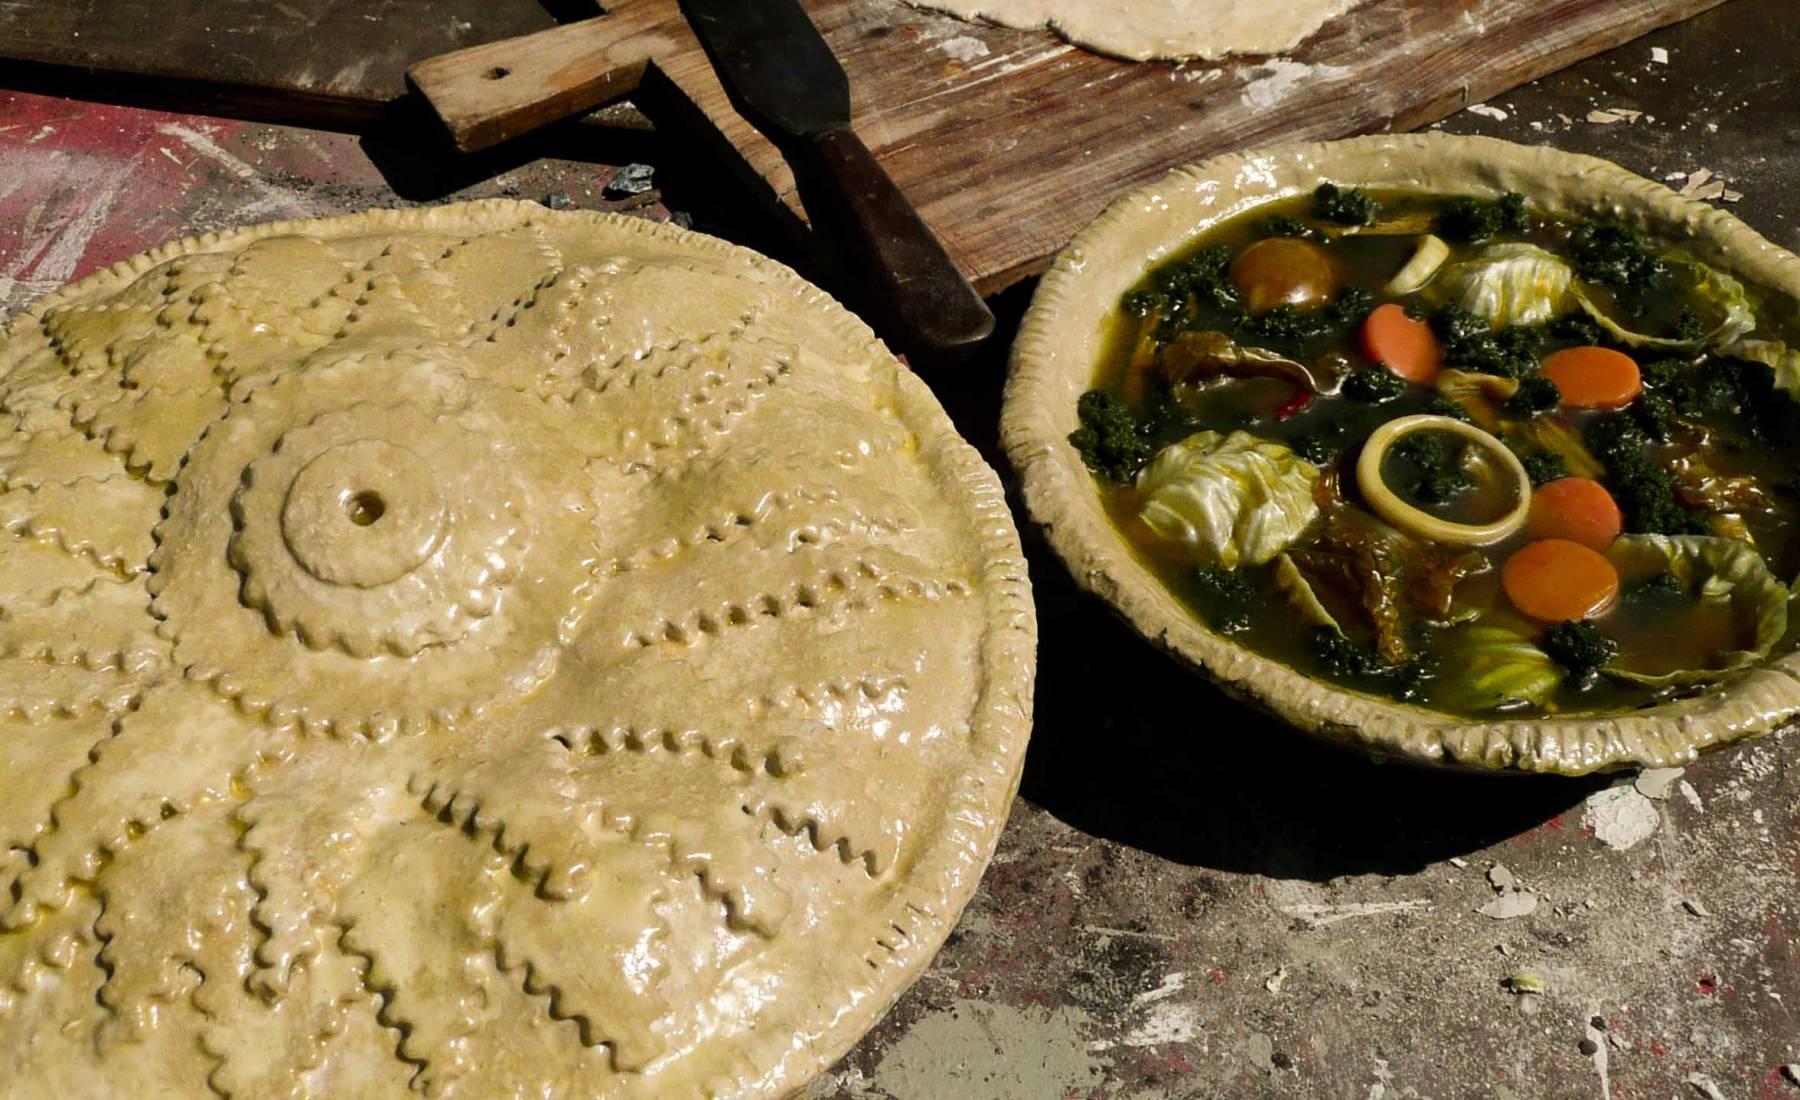 pies, pastry, uncooked, vegetable, chicken, gravy, s.s. Great Britain galley kitchen, feast, dinner, banquet